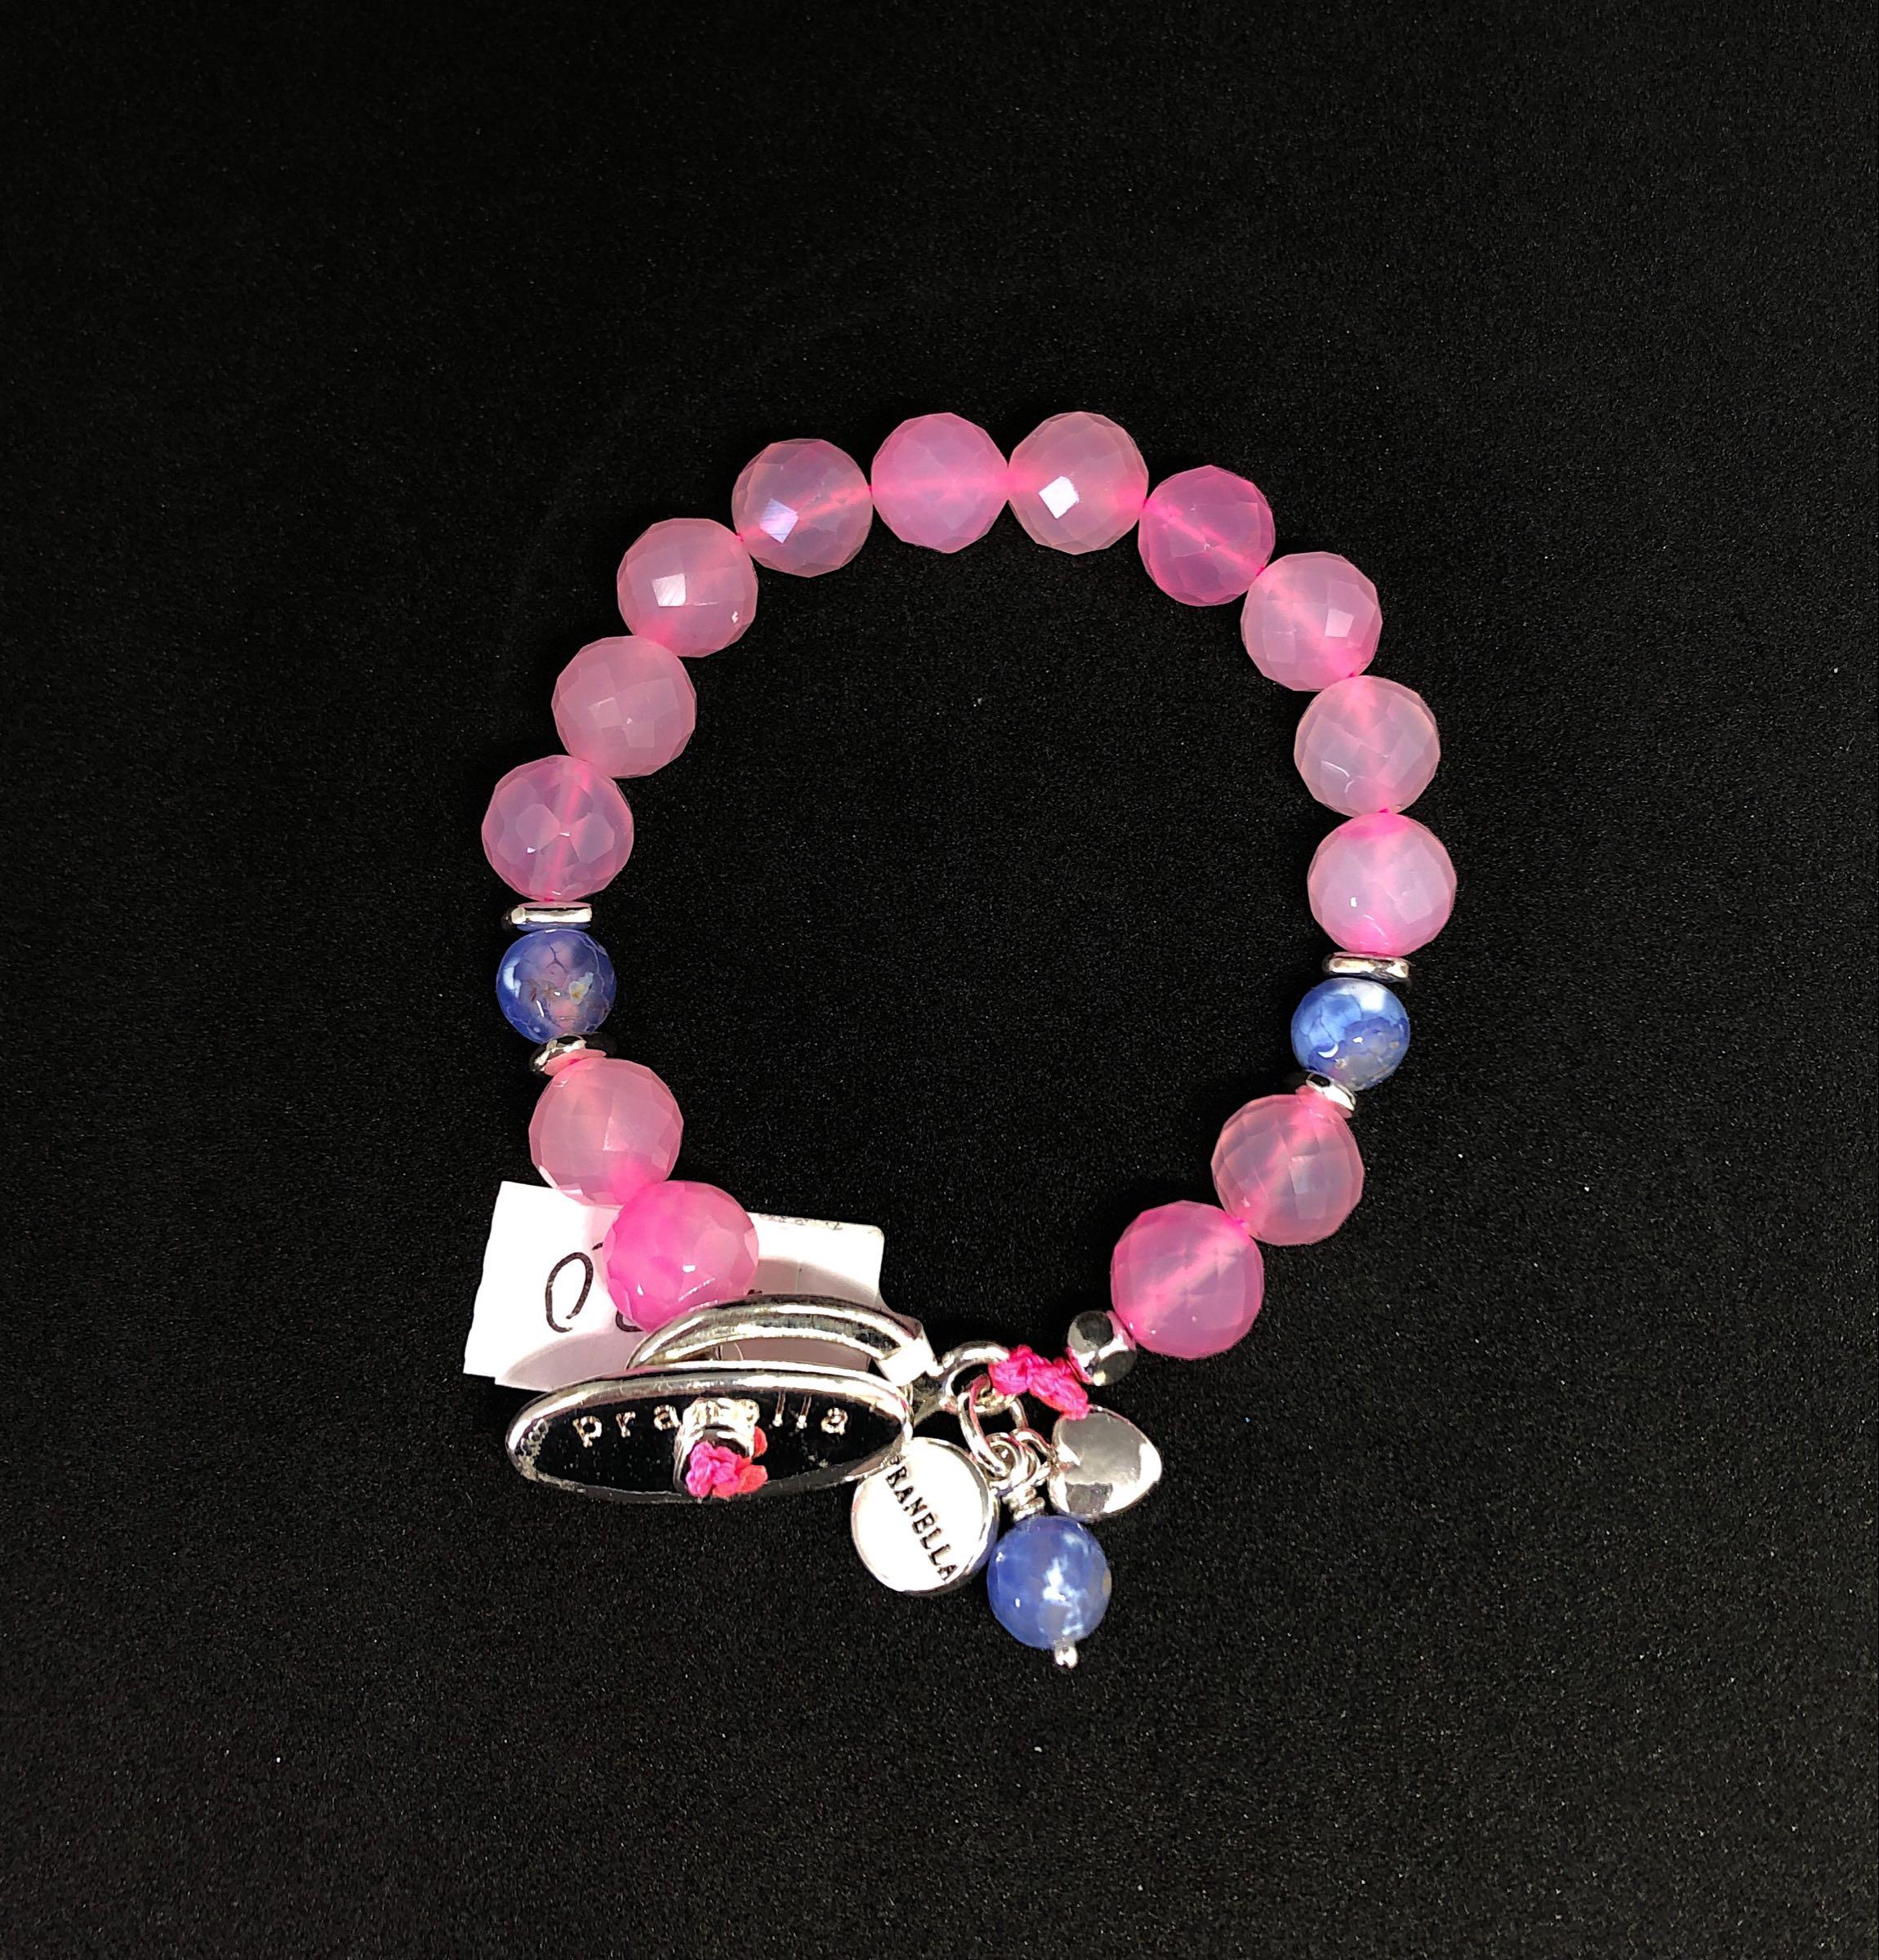 Pranella iris hot pink knot bracelet £20